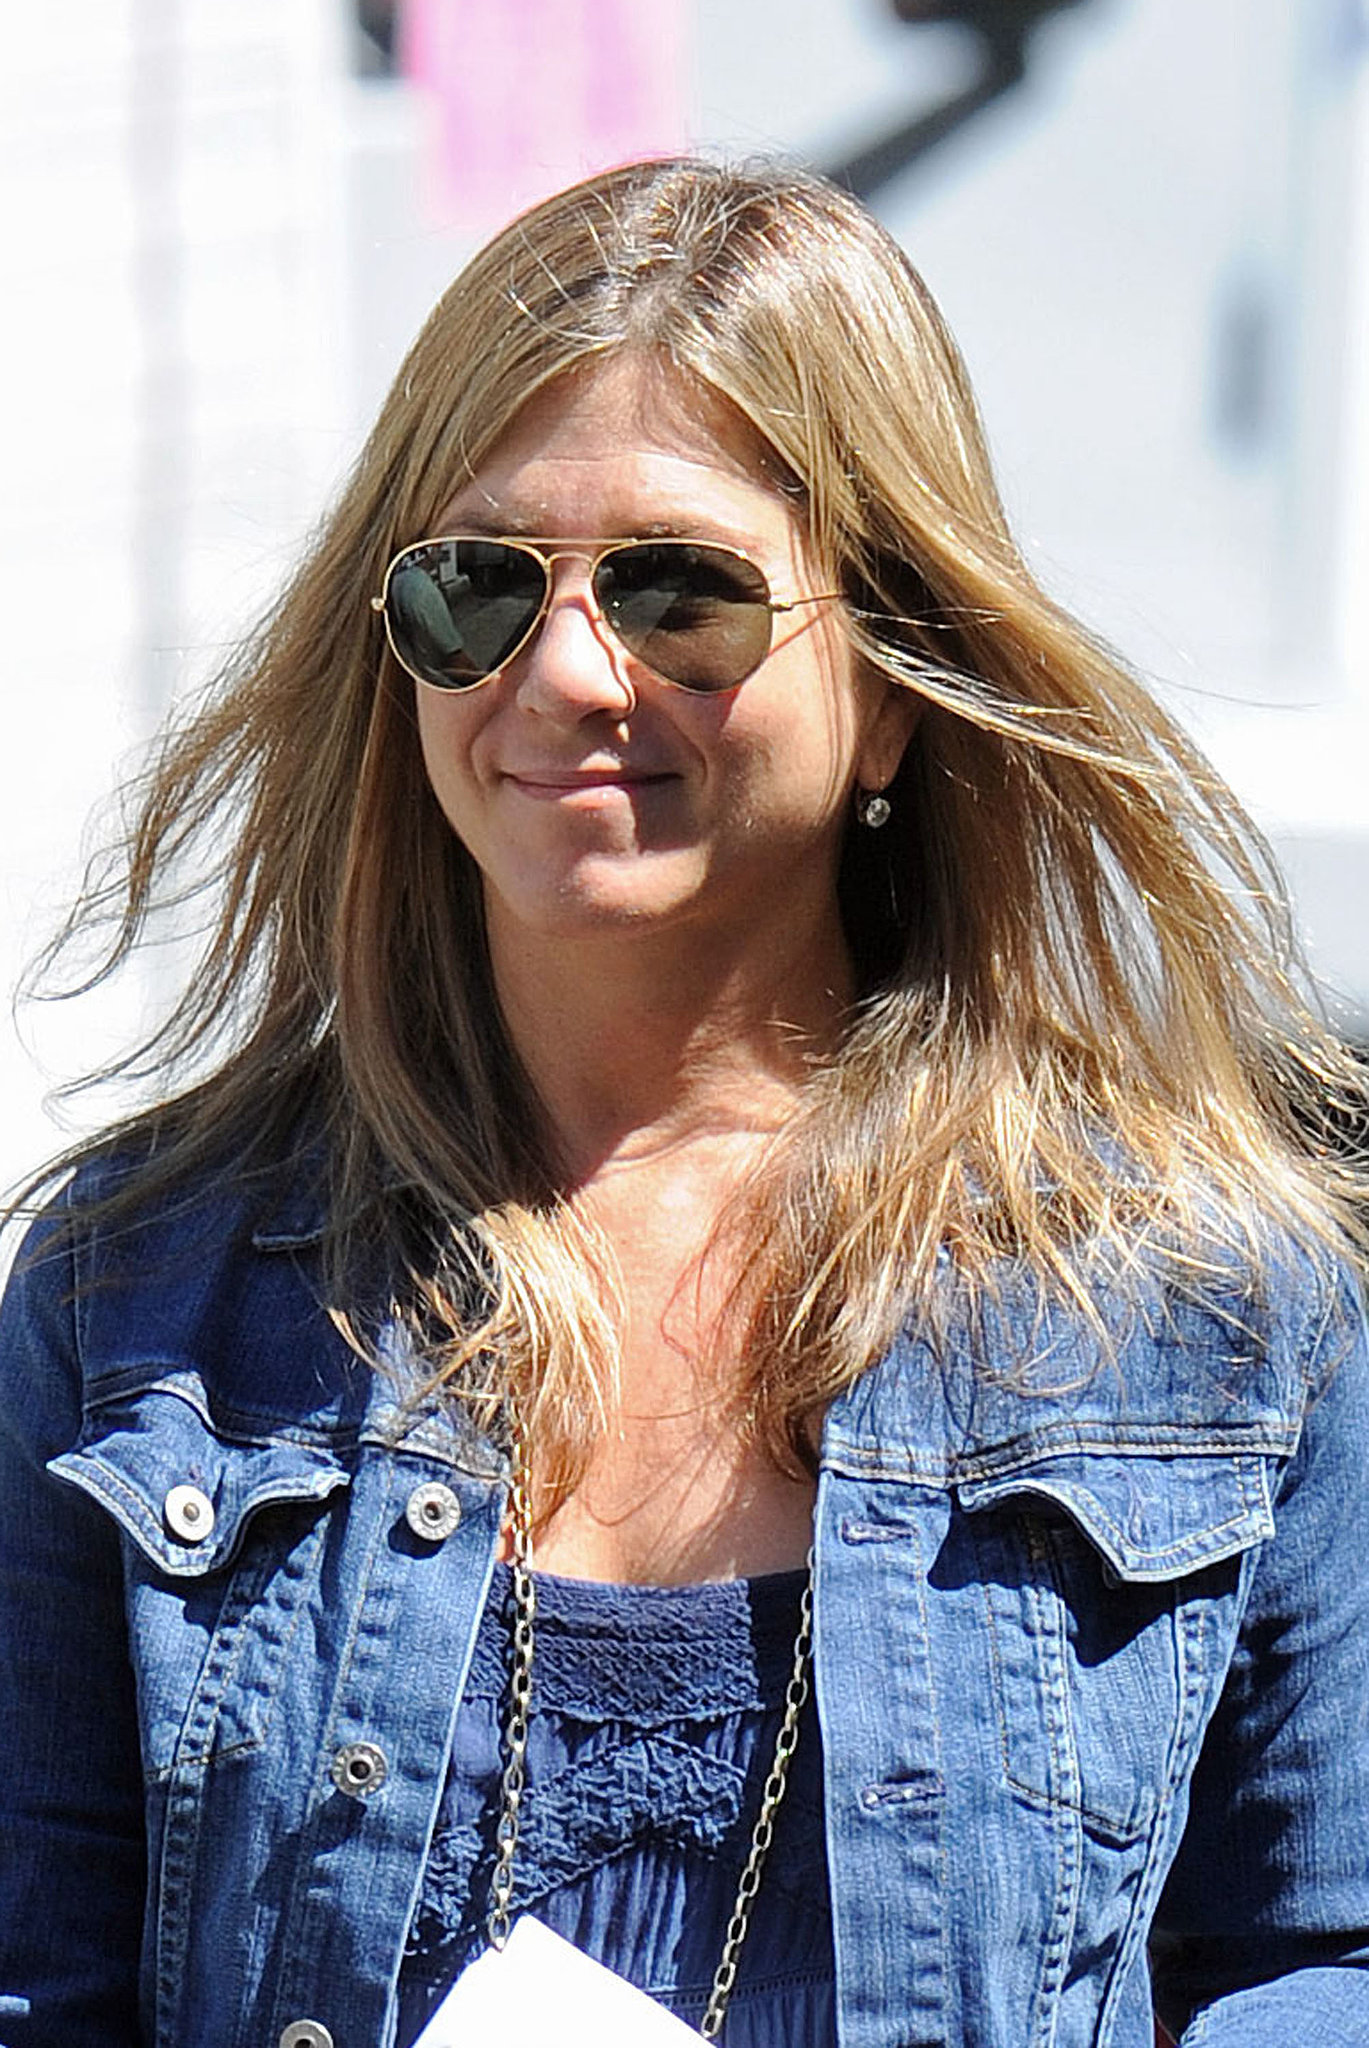 Jennifer Aniston wore aviators on set on July 30.